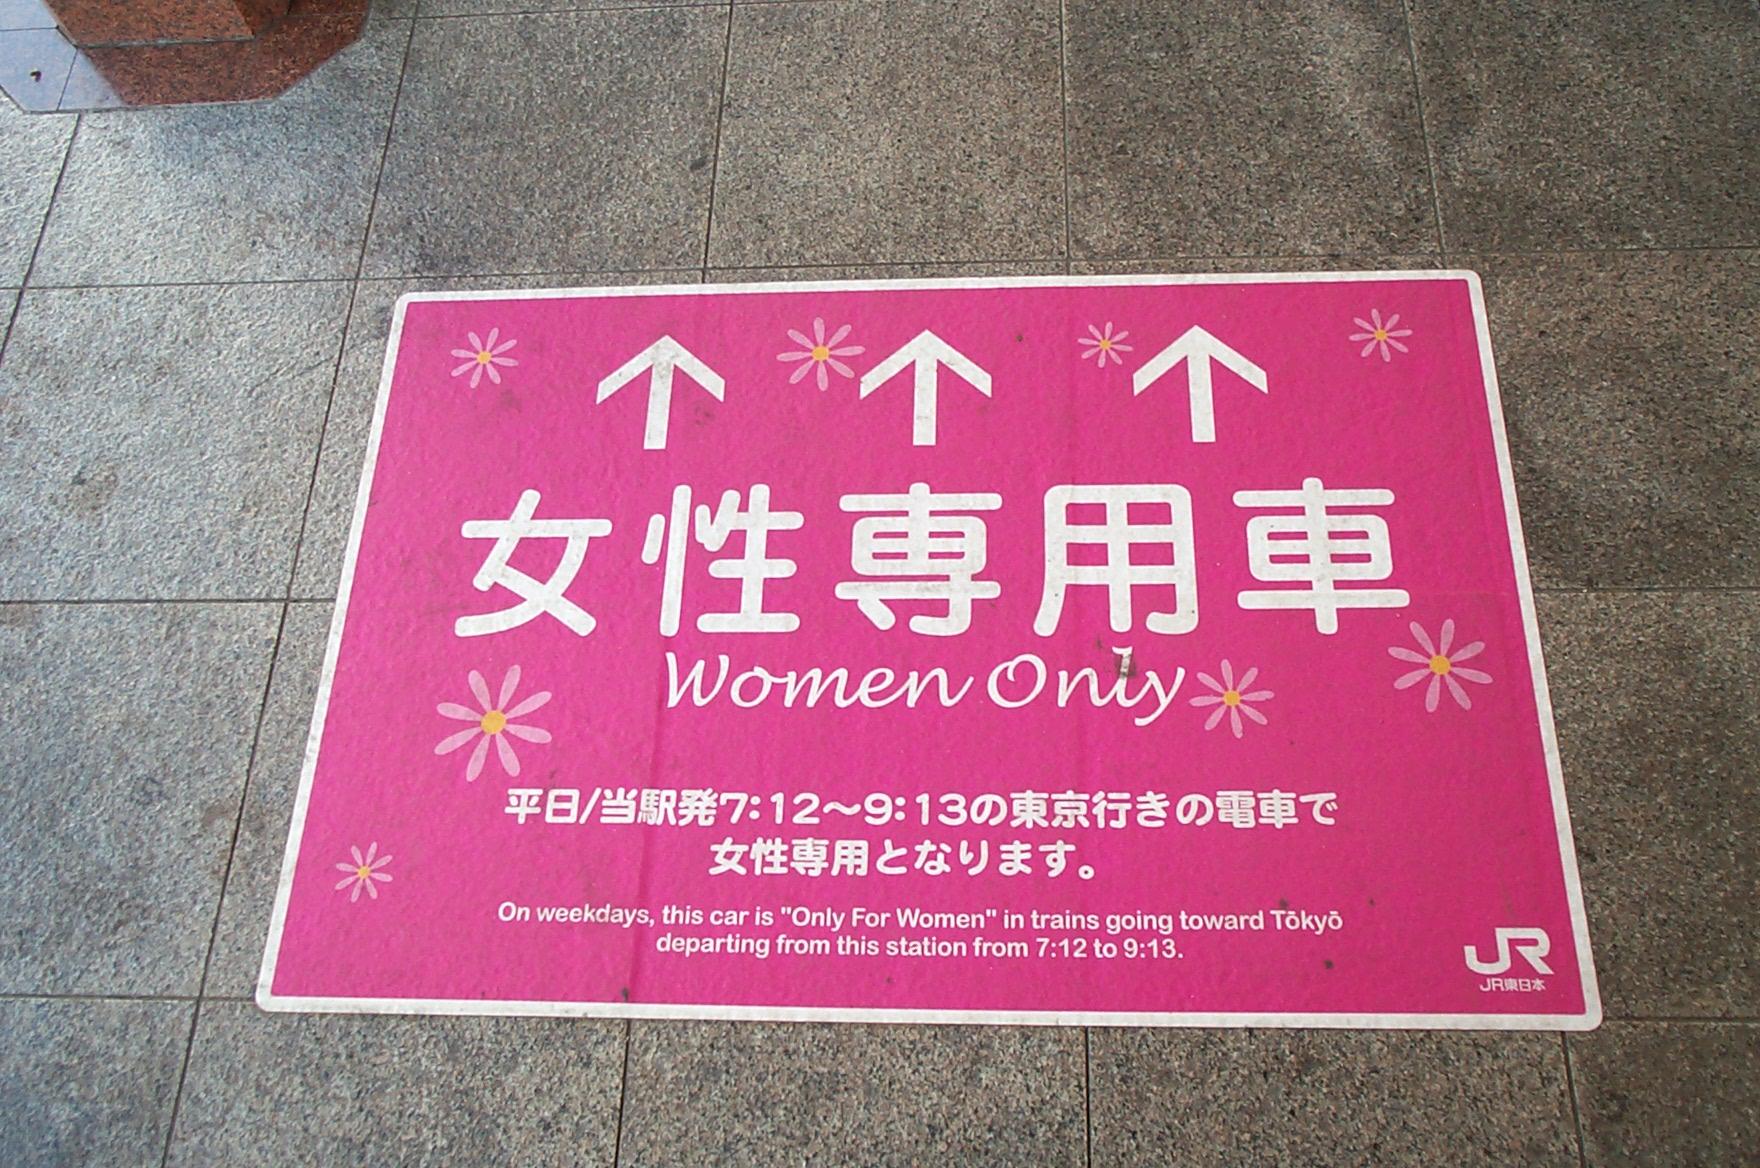 http://livedoor.blogimg.jp/mediaterrace/imgs/f/5/f54d3ef4.JPG